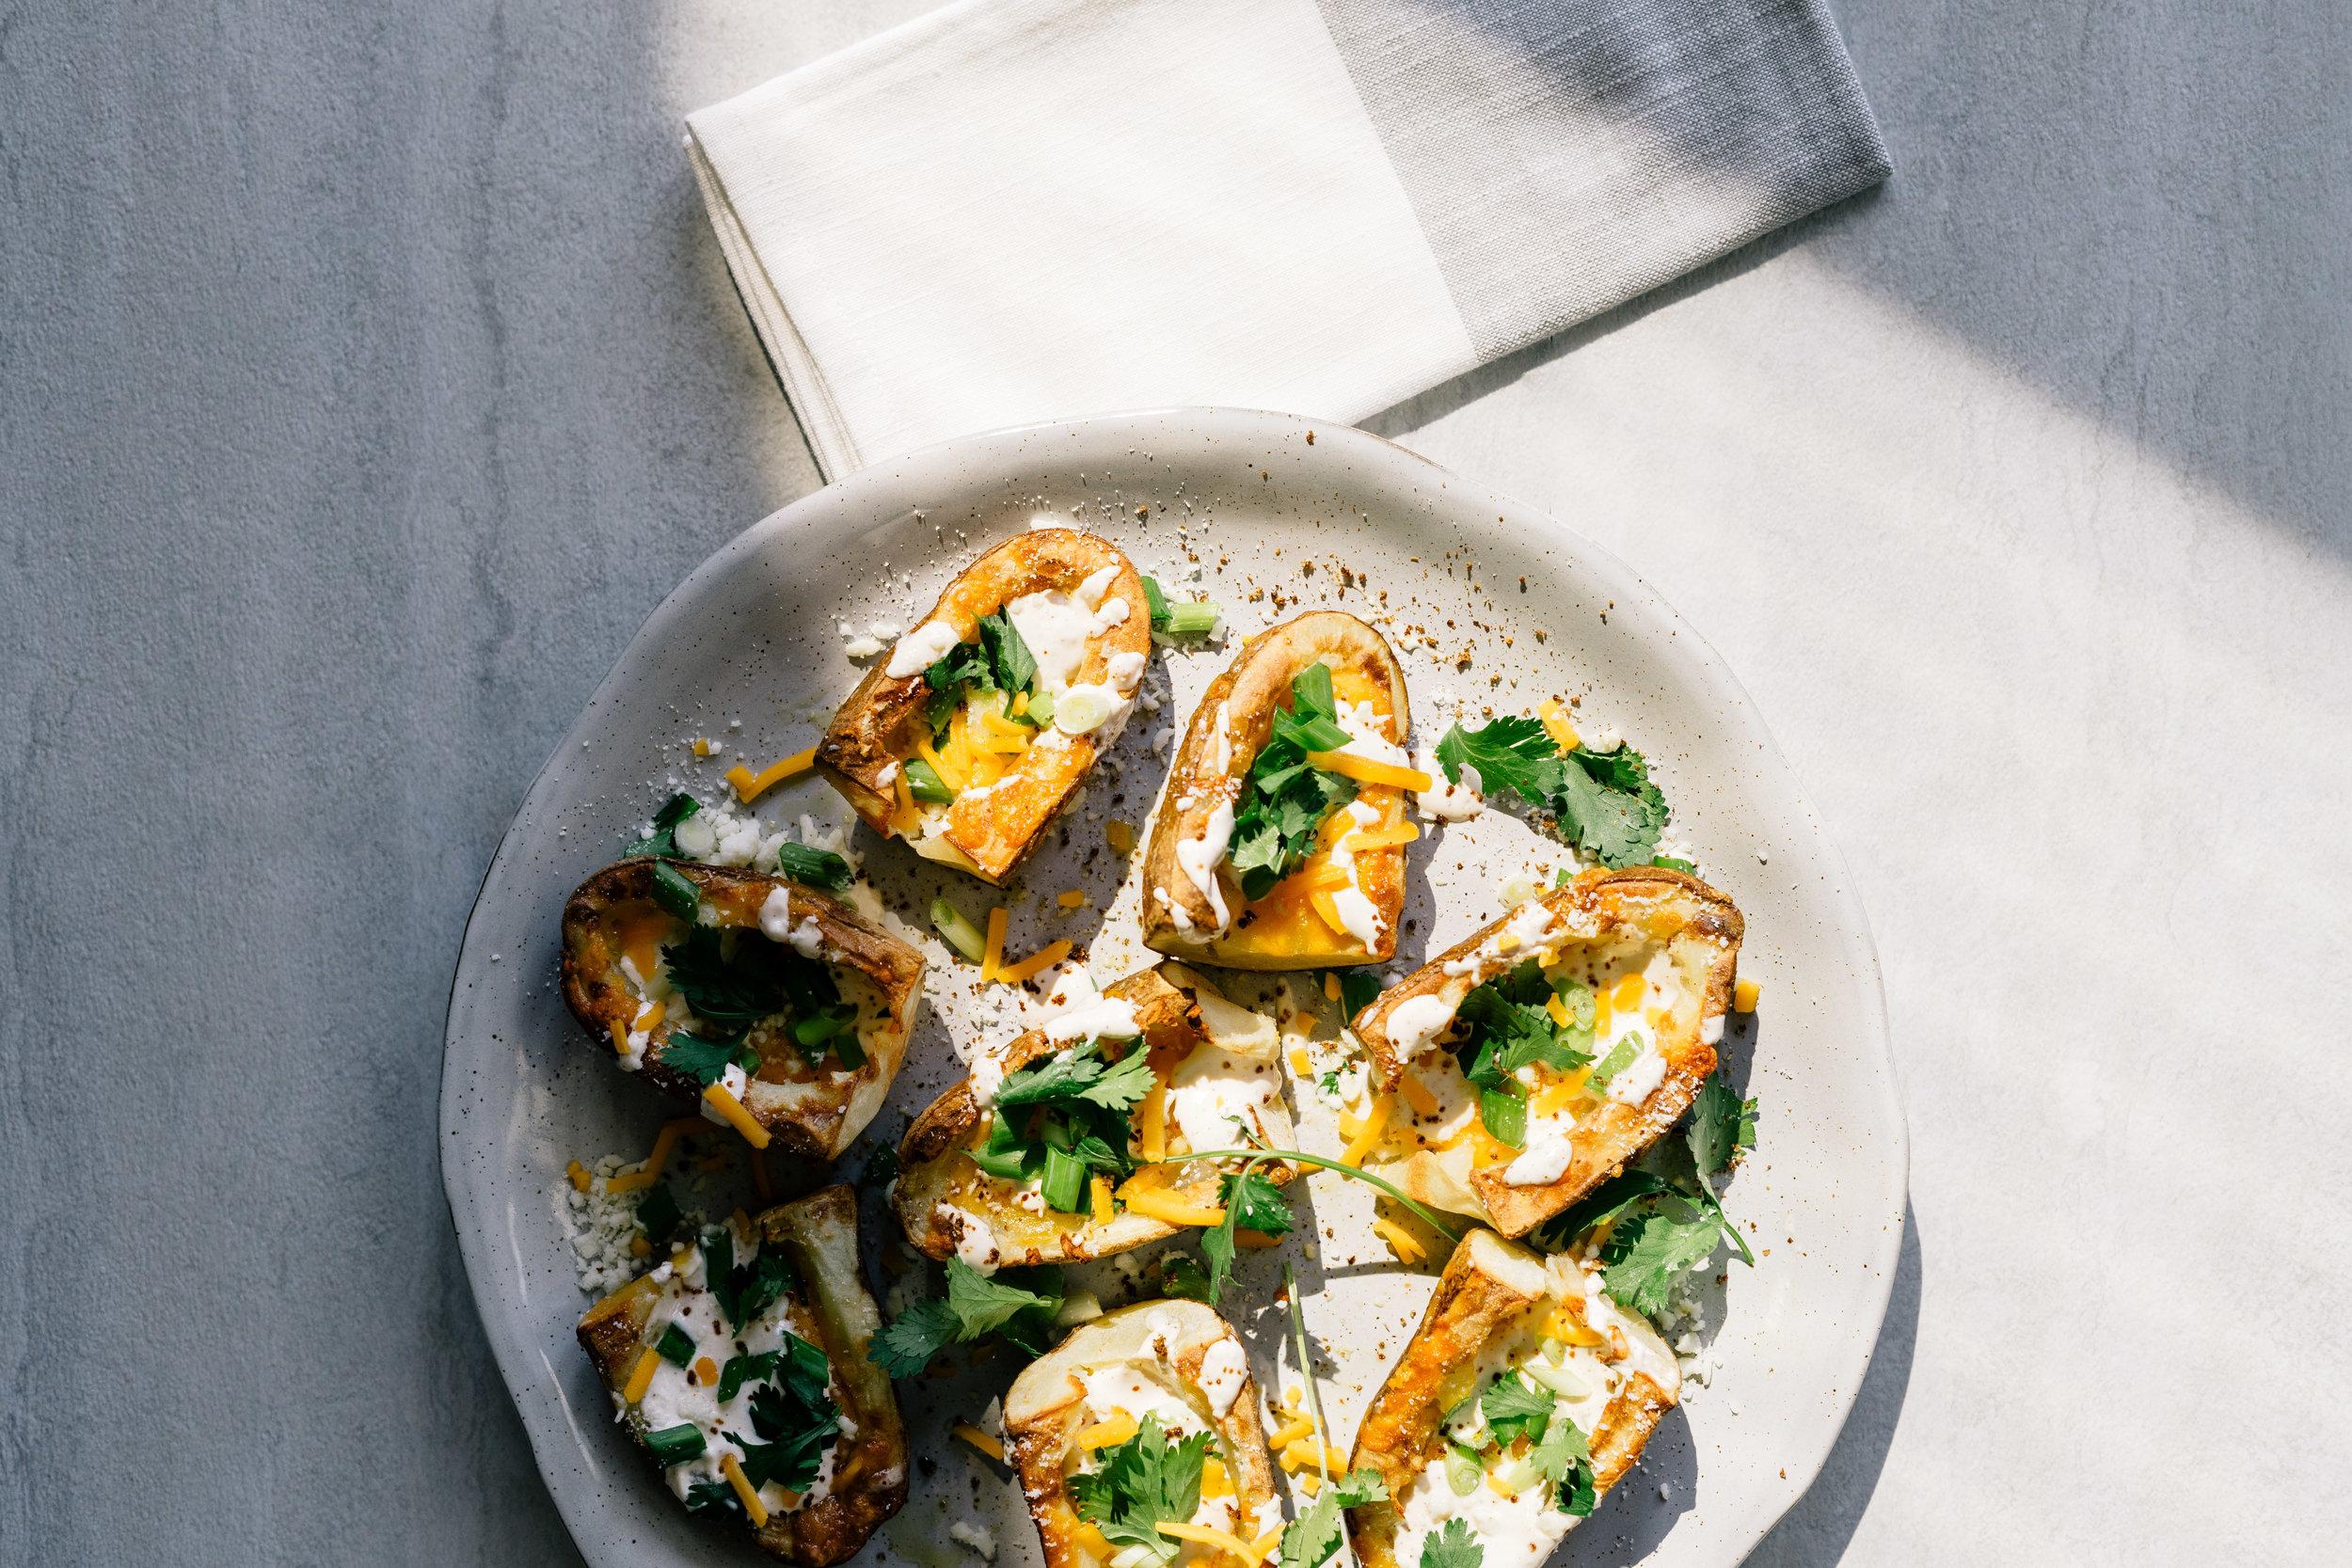 Potato Skins with Crema and Cotija Cheese